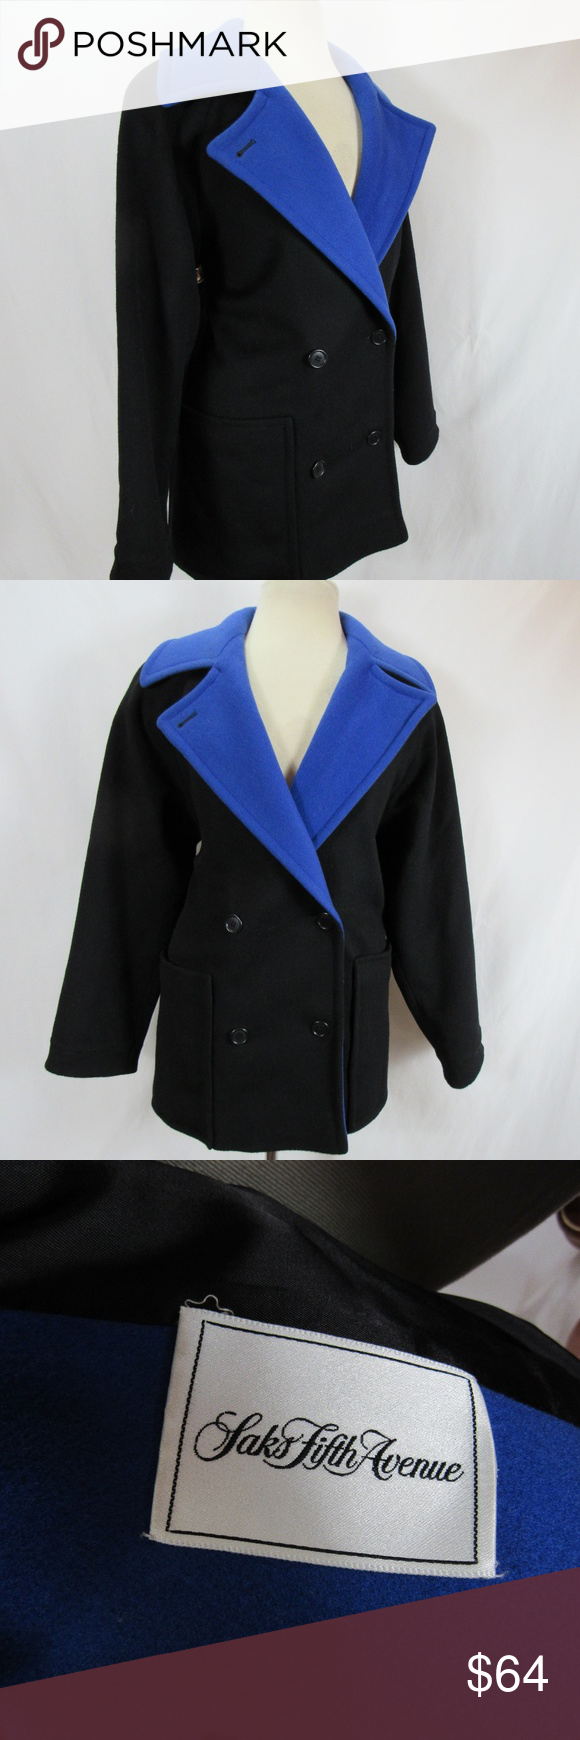 5544d4acb9 Saks Fifth Ave Black Blue Wool Peacoat sz 8 Medium Women s vintage Cuddle  Coat New York